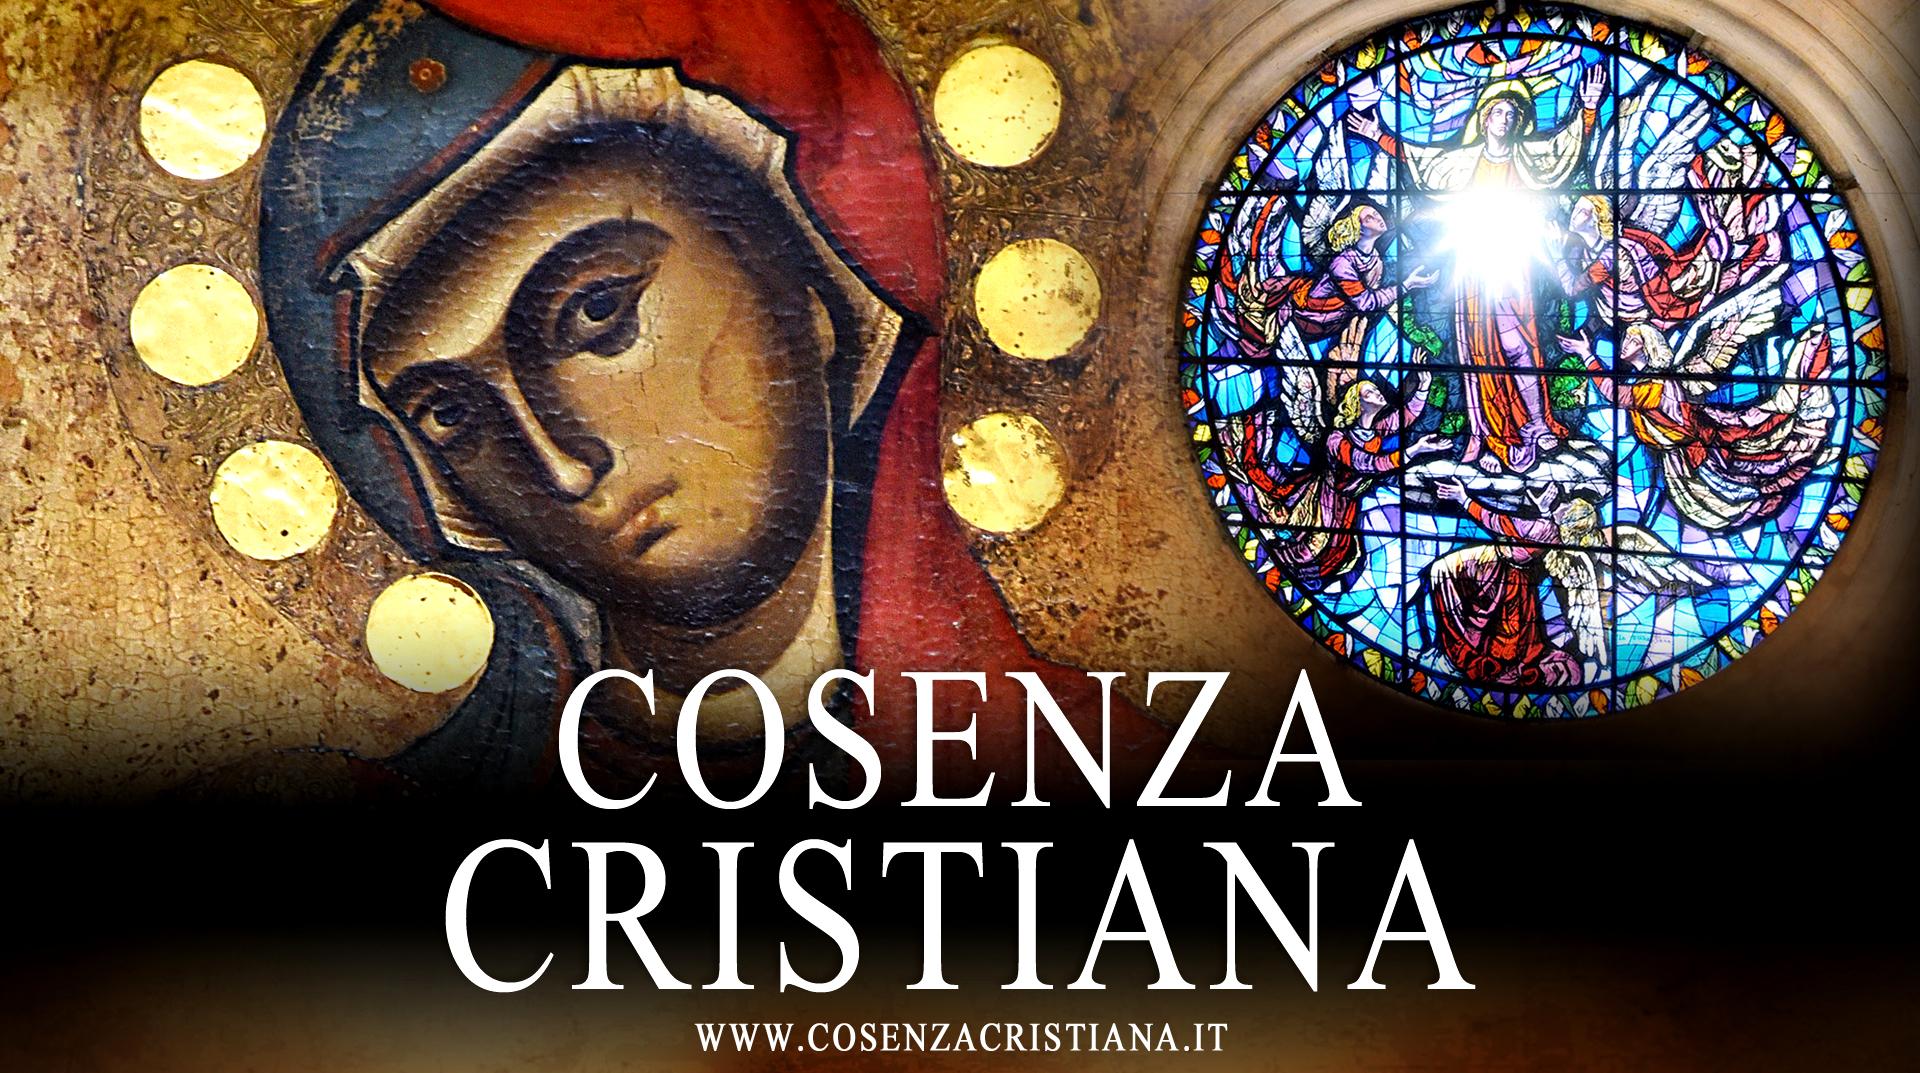 COSENZA CRISTIANA